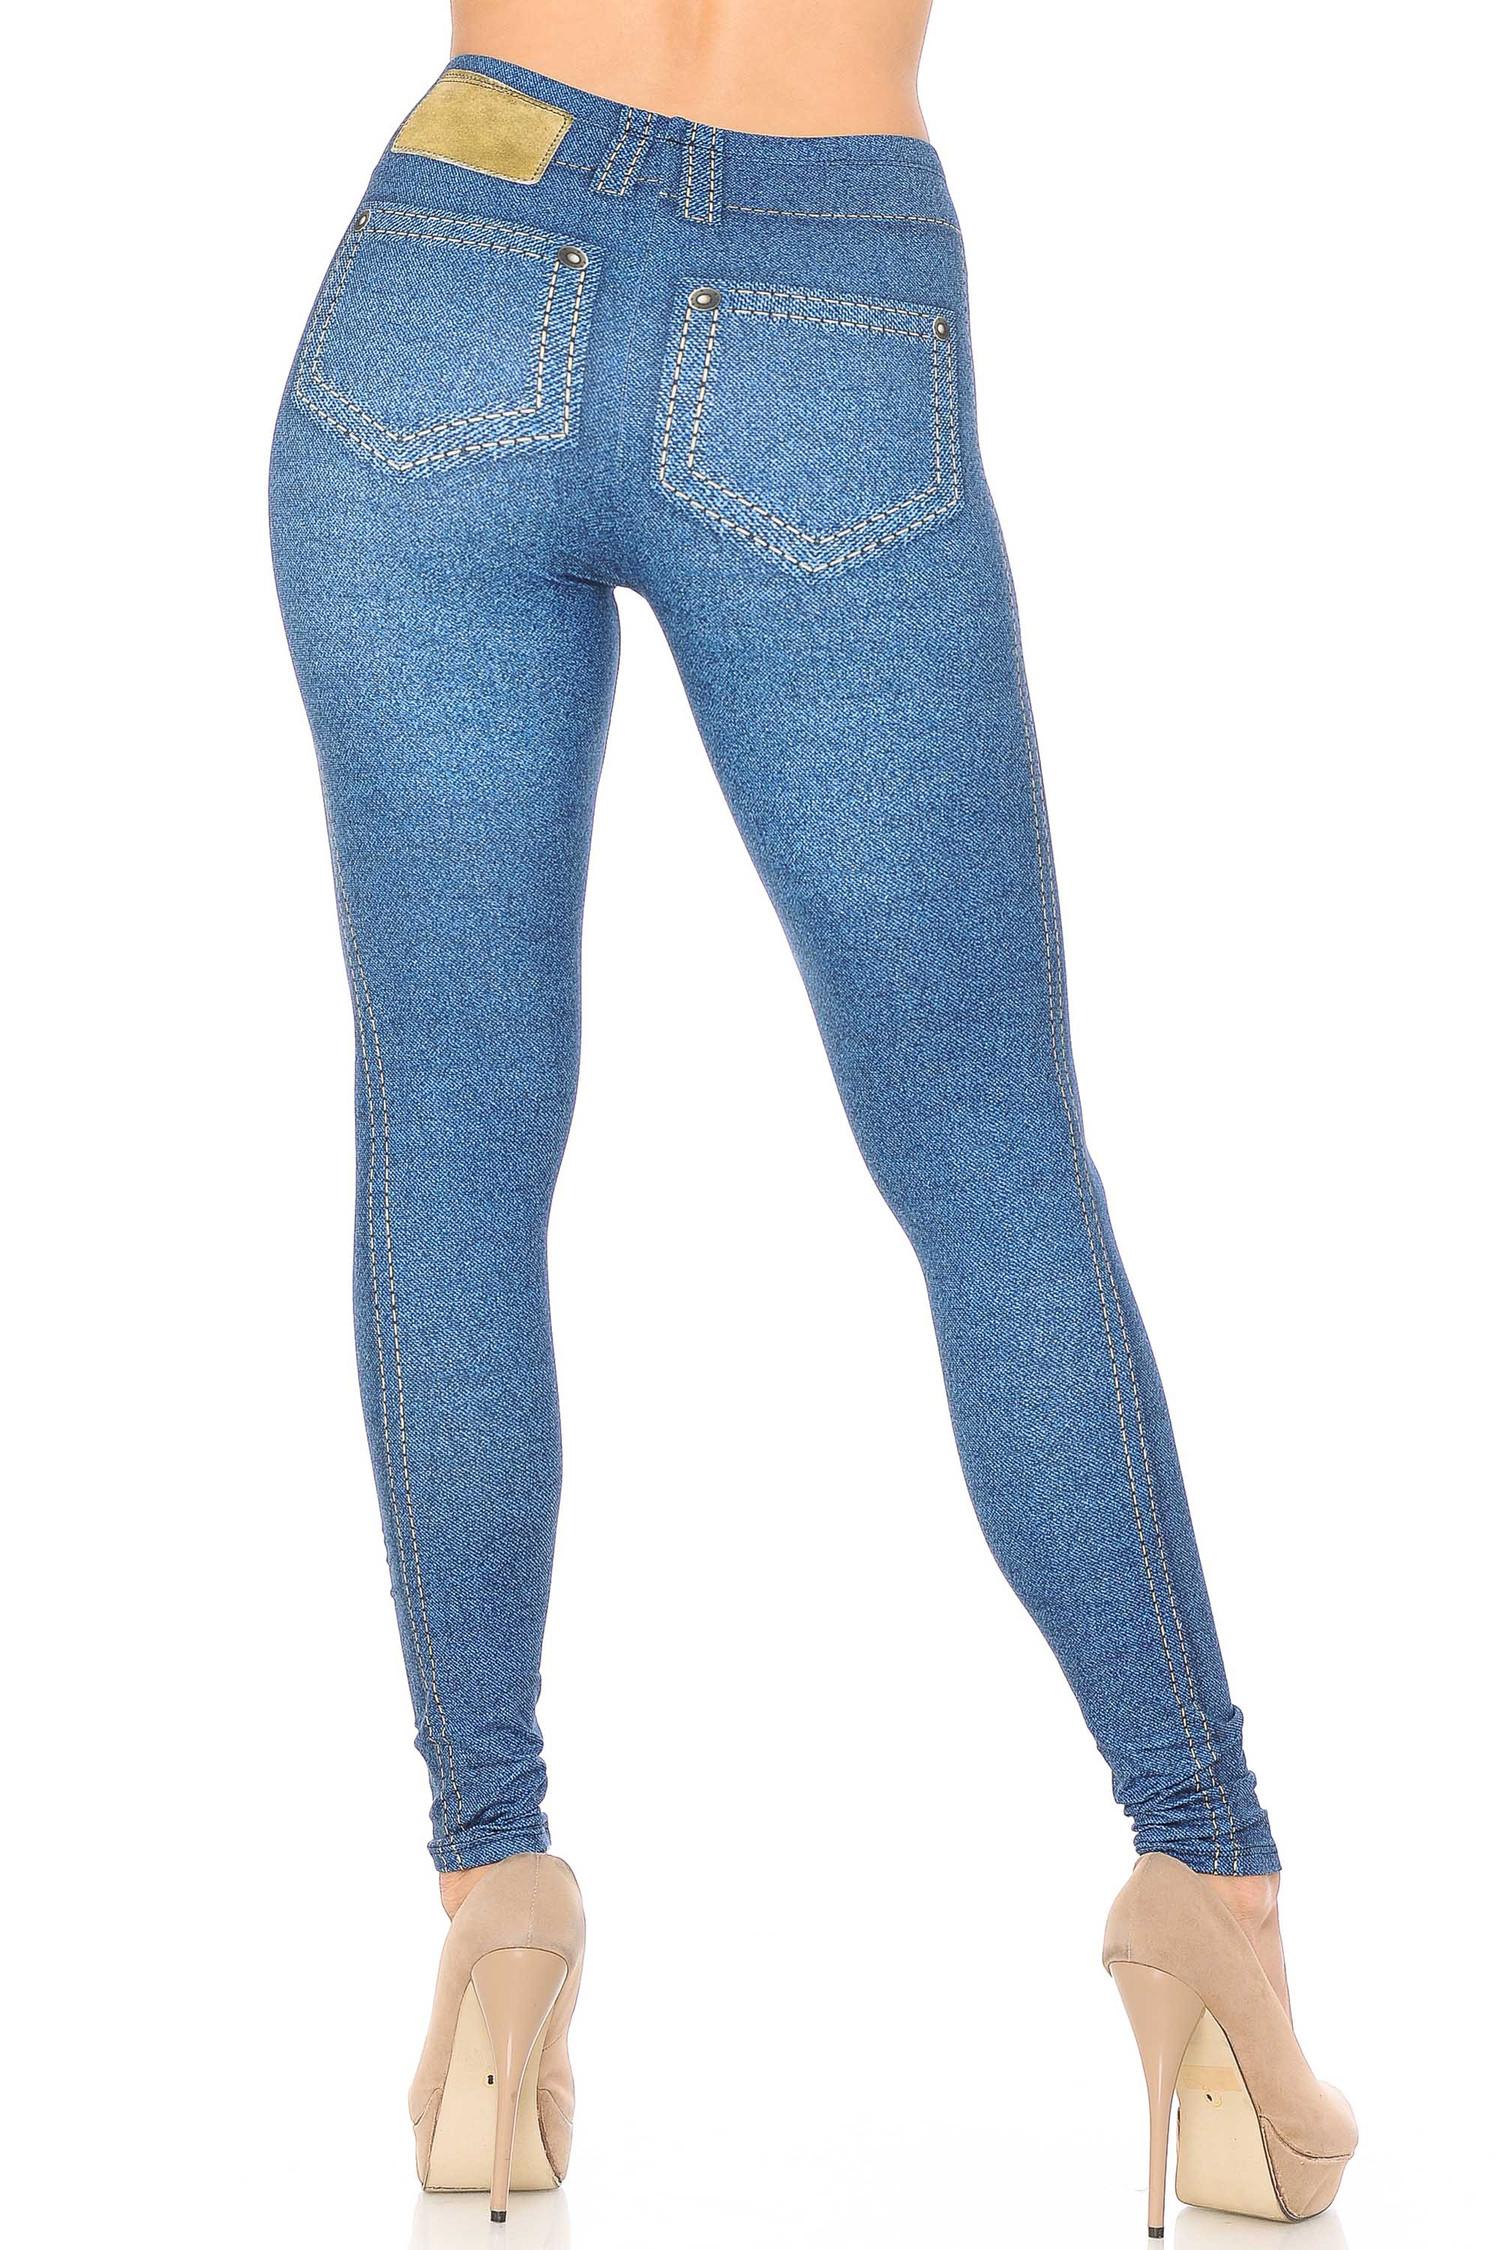 Creamy Soft Dark Blue Denim Jean Plus Size Leggings - By USA Fashion™